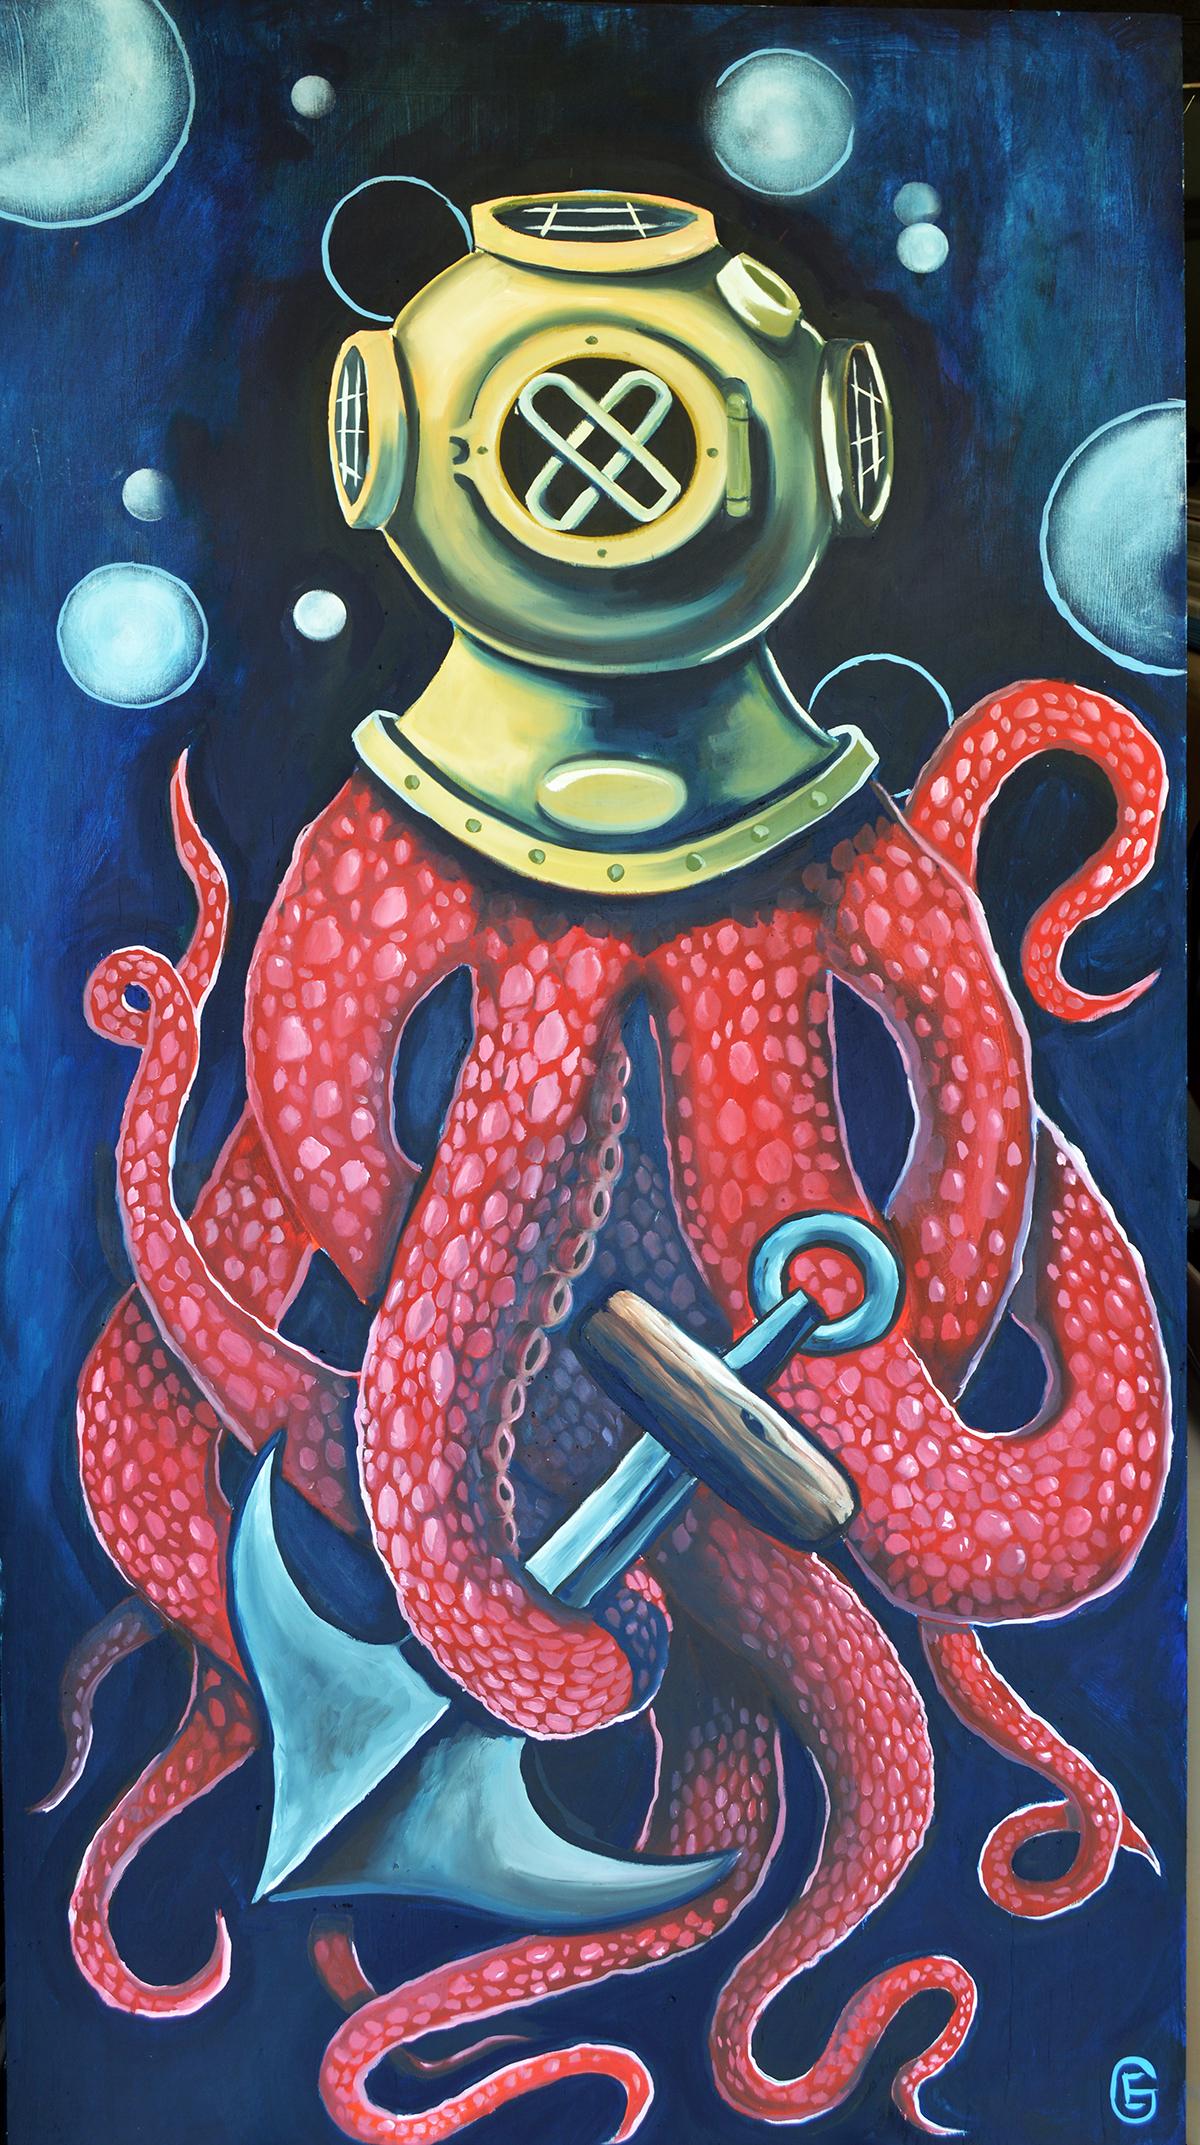 Octopus-website.jpg